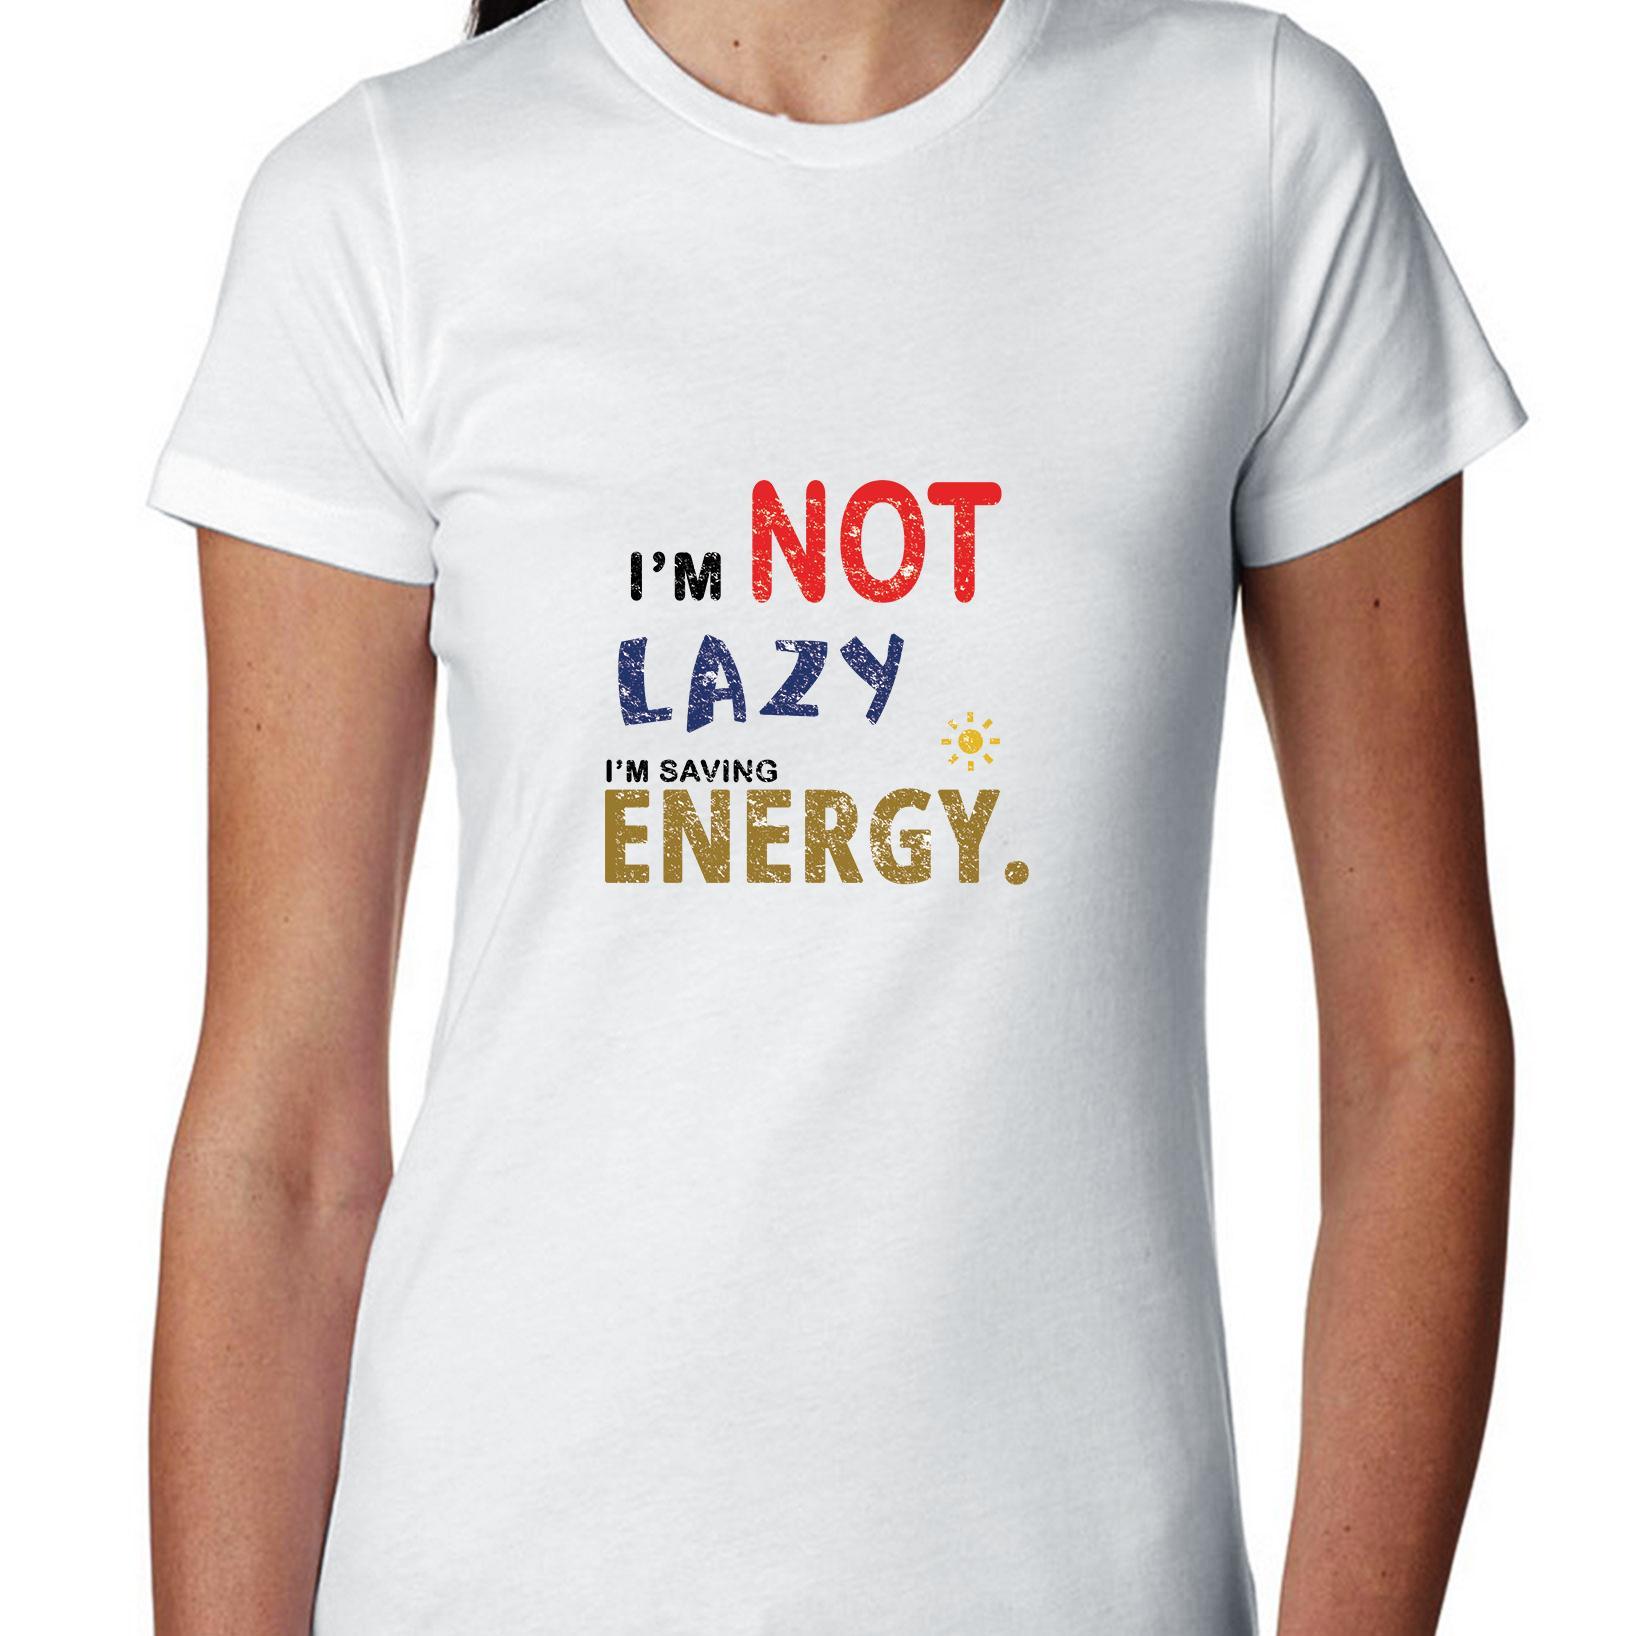 I'm Not Lazy - I'm Saving Energy Sarcastic Women's Cotton T-Shirt